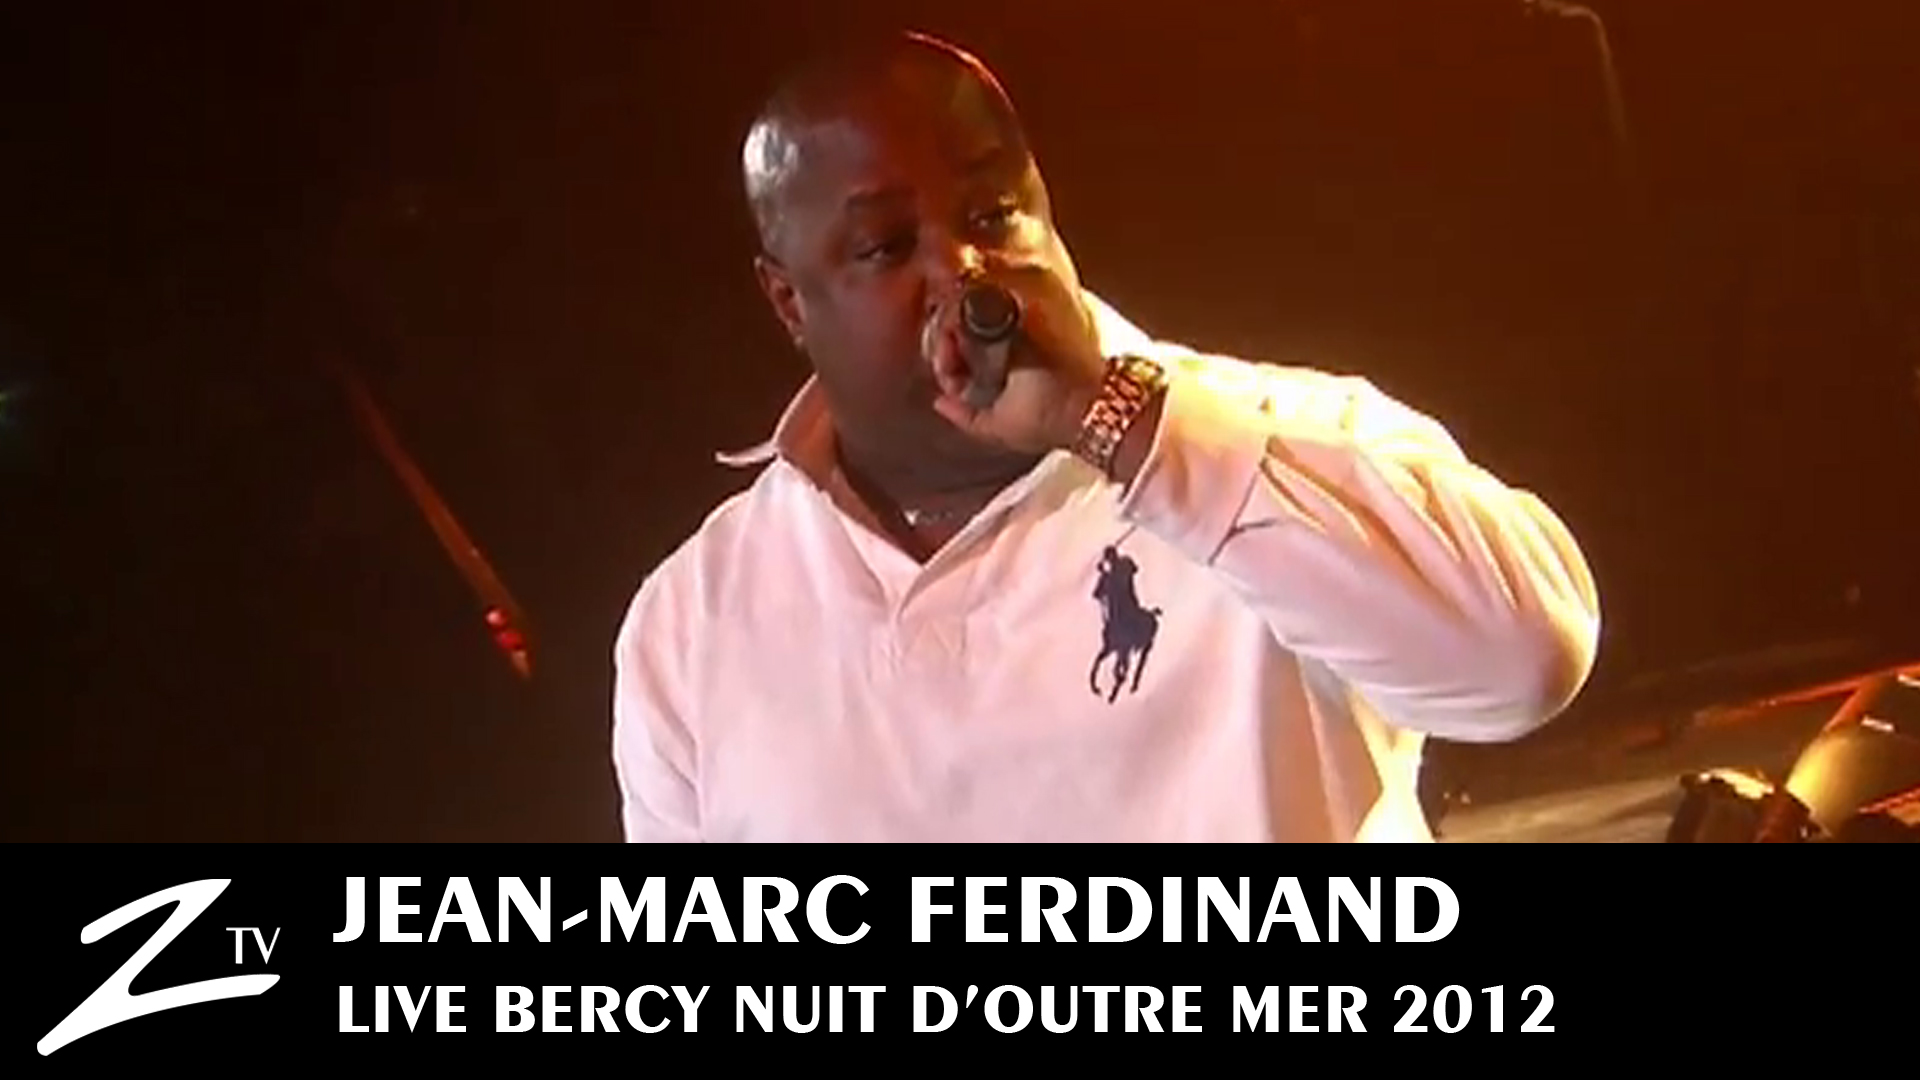 Jean-Marc Ferdinand